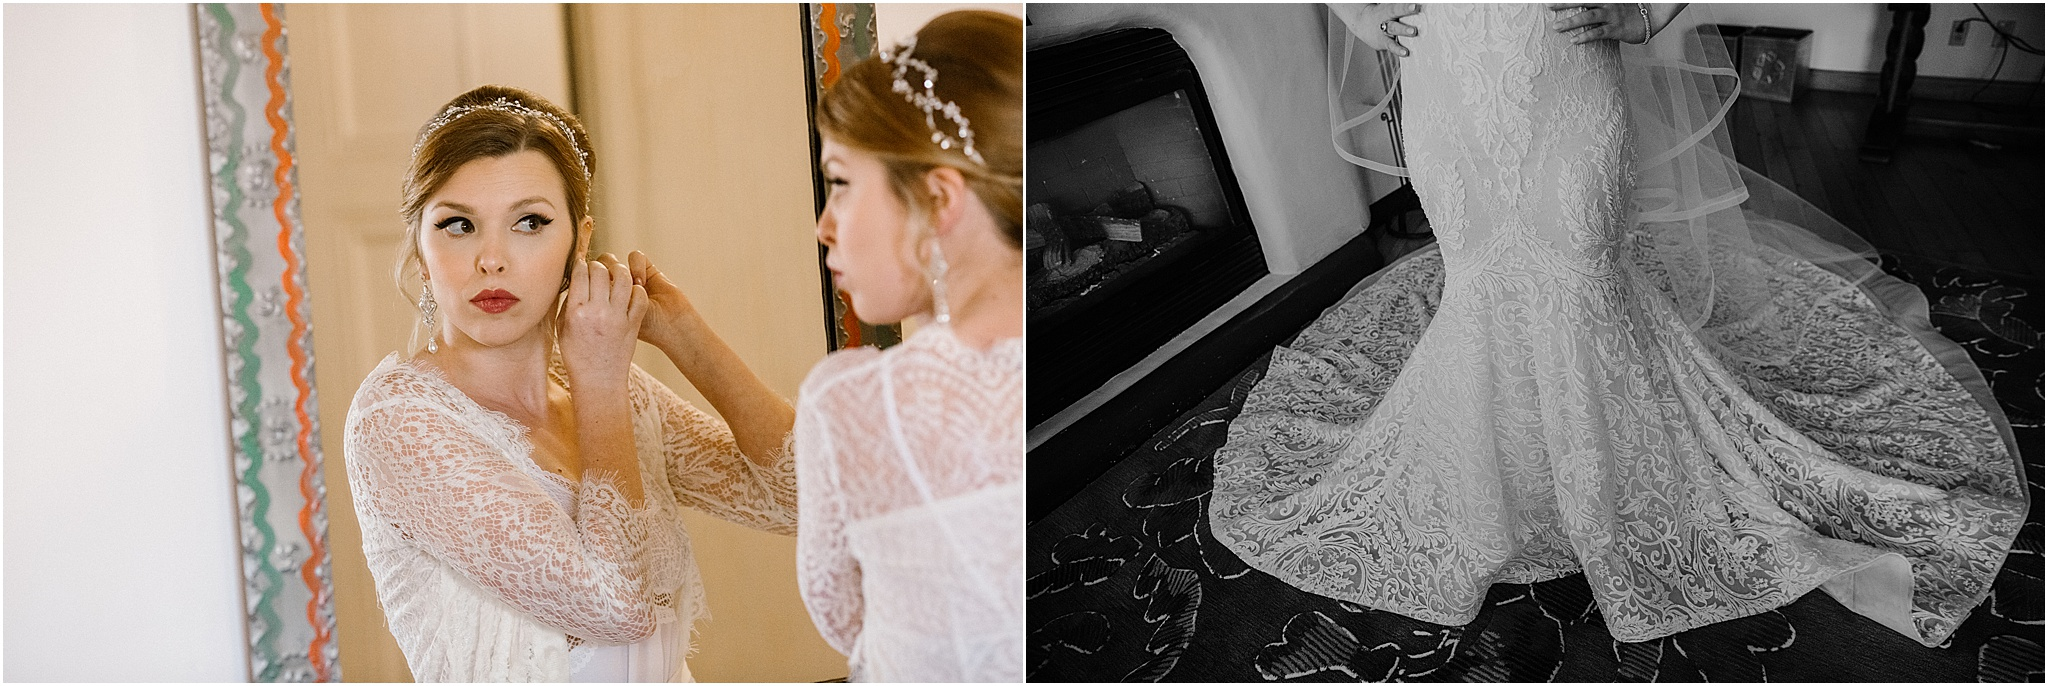 BLUE ROSE PHOTOGRAPHY SANTA FE WEDDING_8